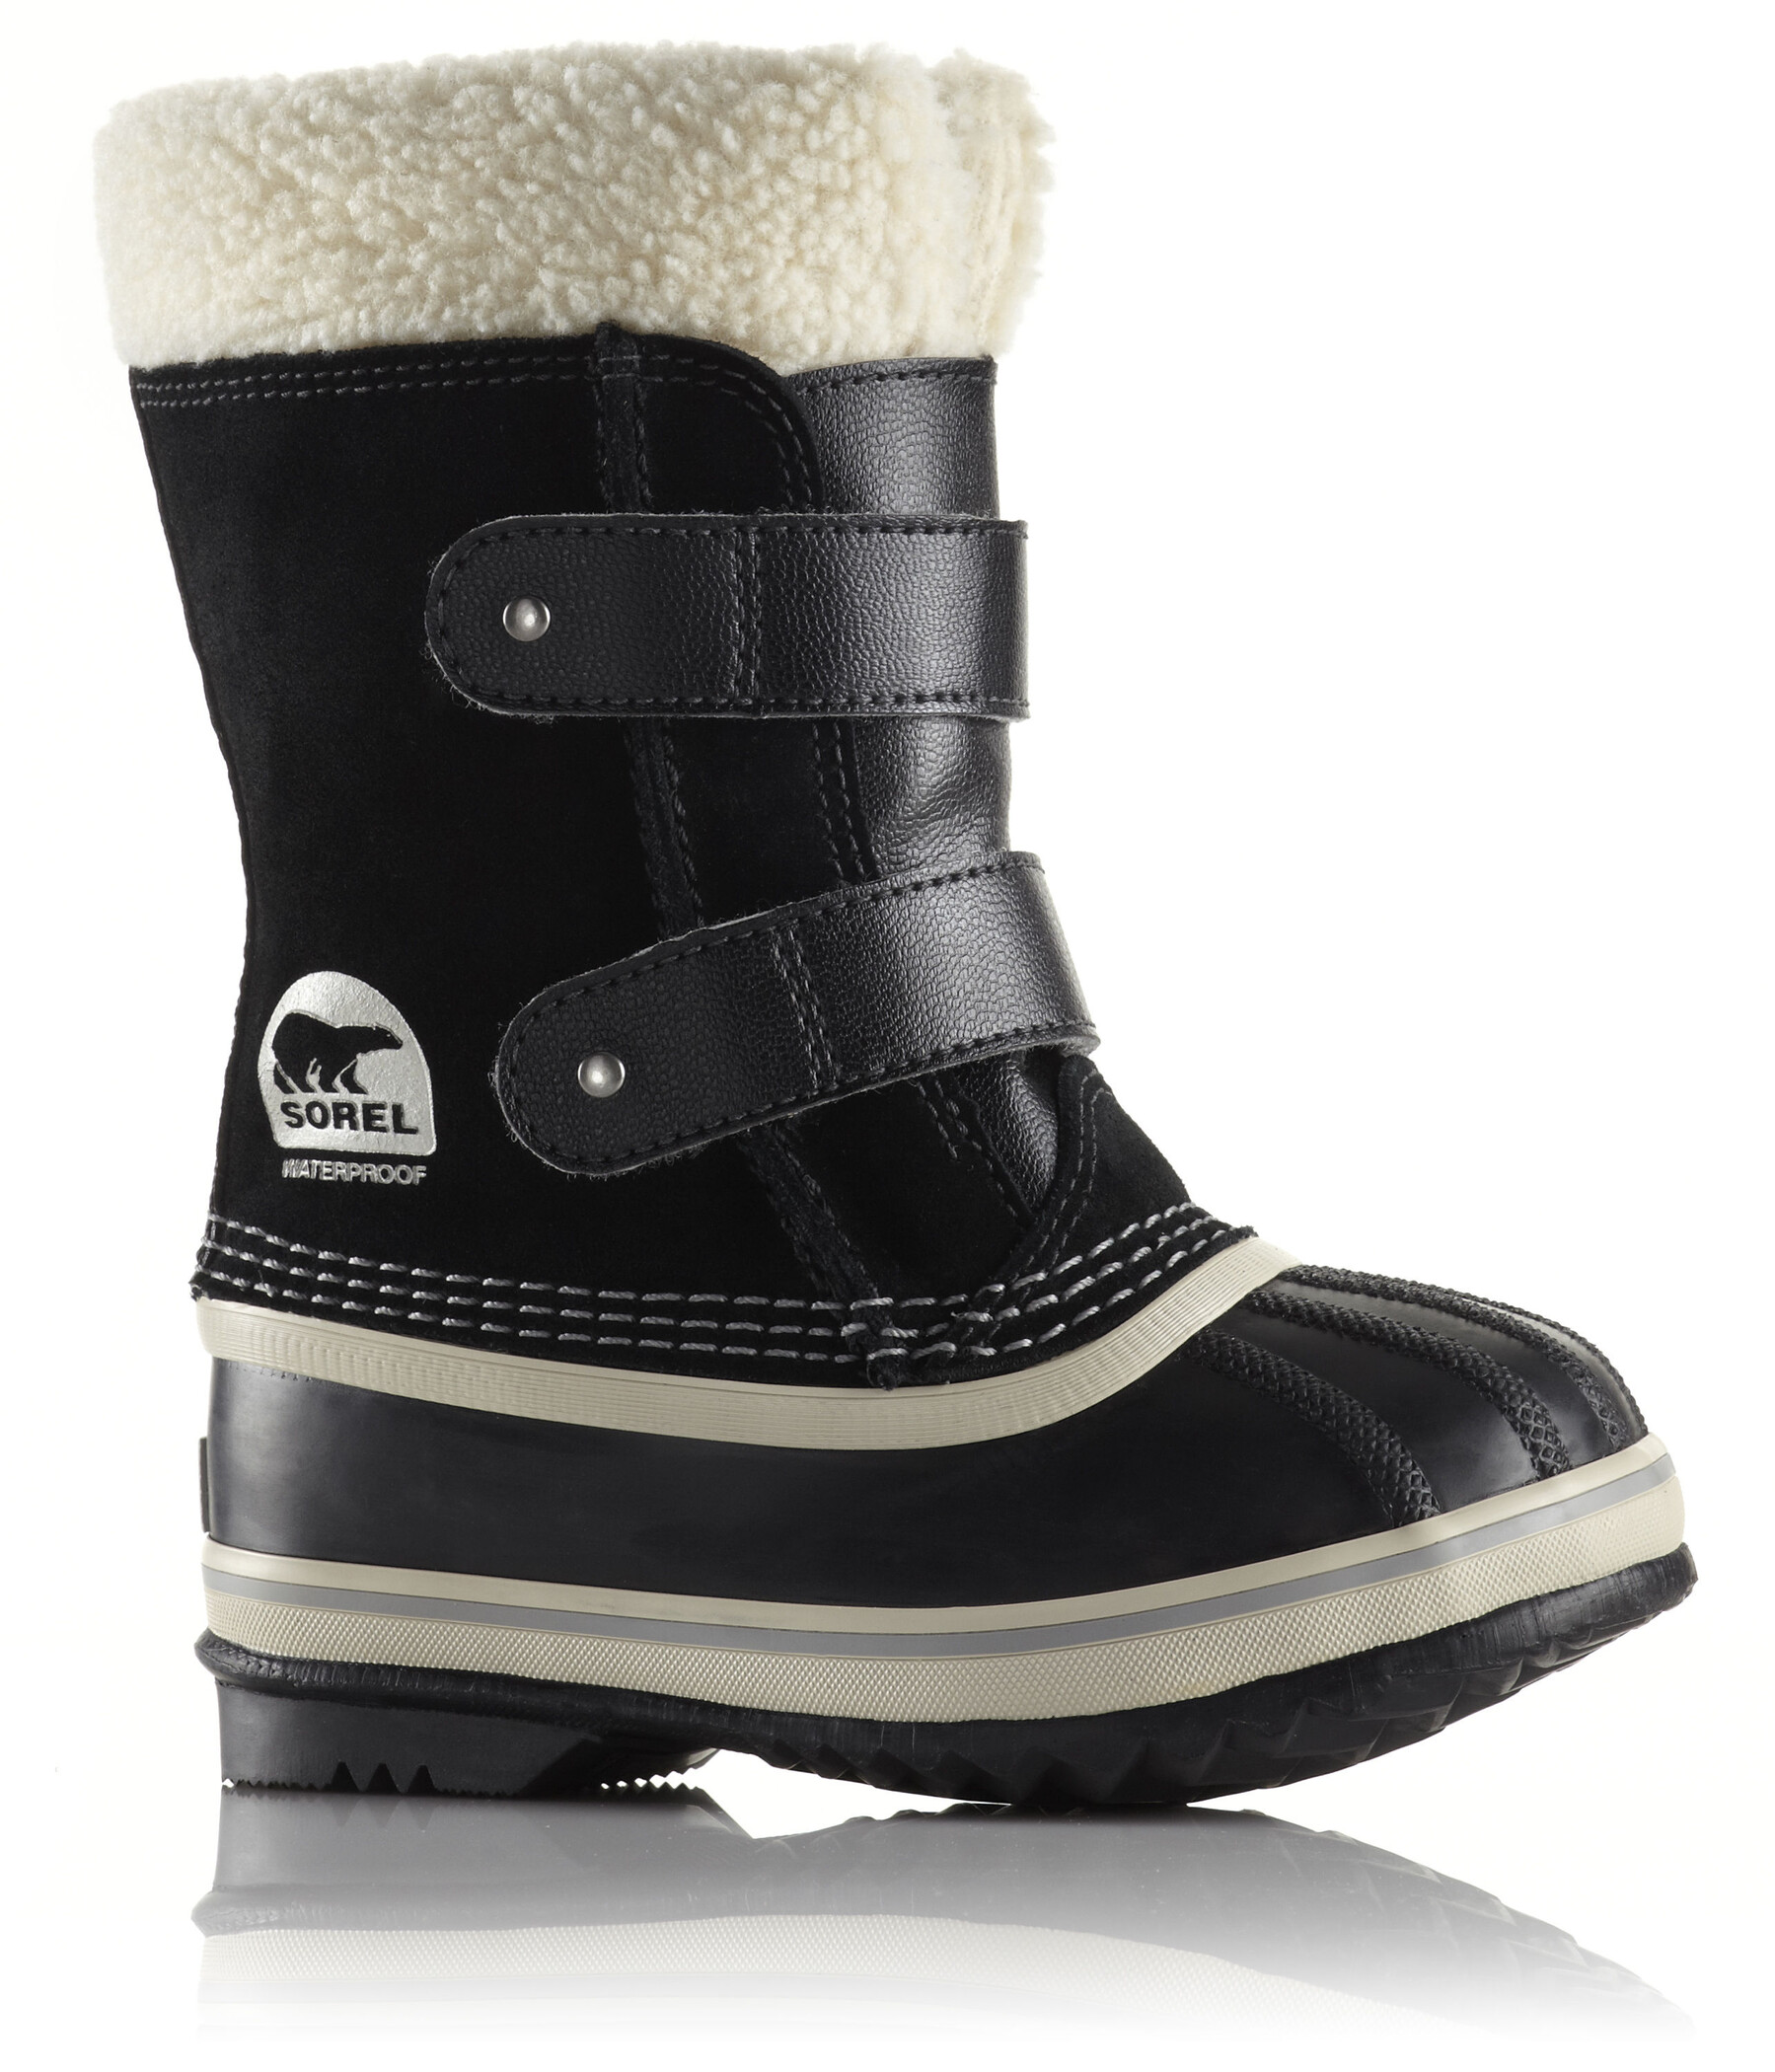 7daee5c619 https://www.addnature.com/patagonia-barely-baggies-shorts-women ...